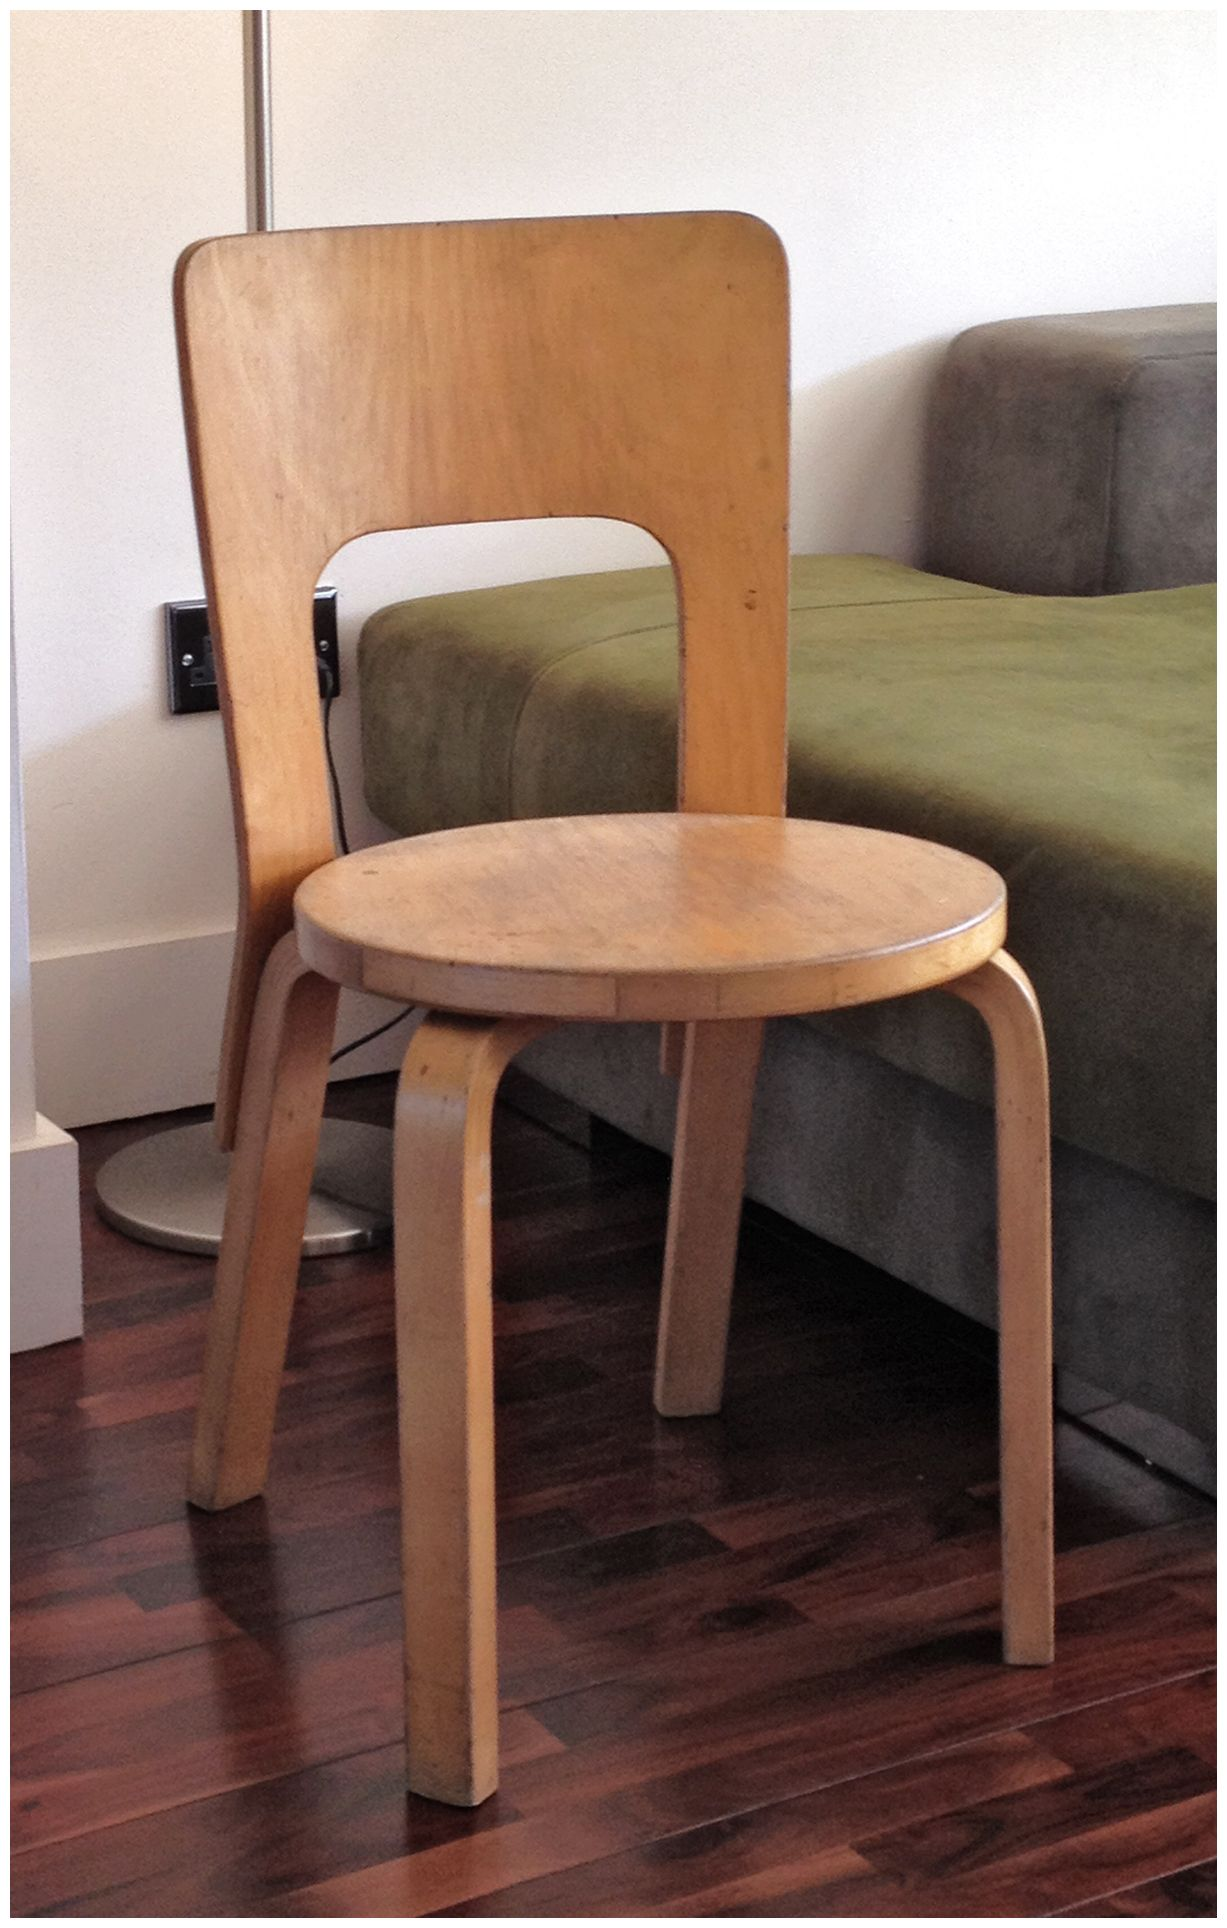 Original alvar aalto 66 chair alvar aalto pinterest for Chaise 66 alvar aalto